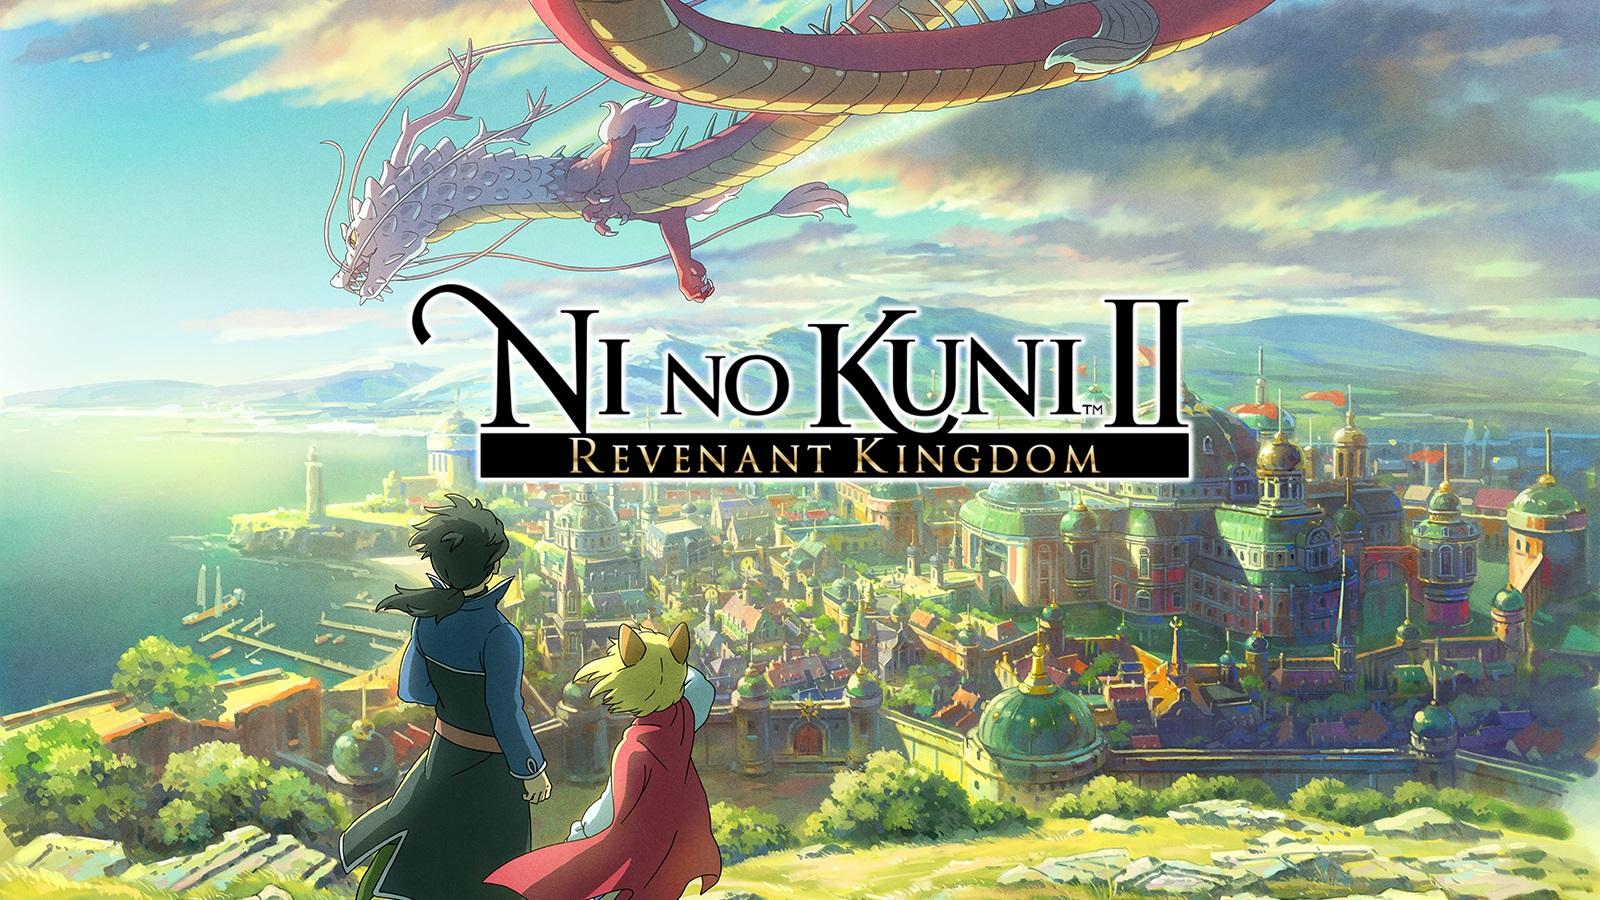 Ni no Kuni II: Revenant Kingdom - The Prince's Edition Switch rating surfaces - Nintendo Everything